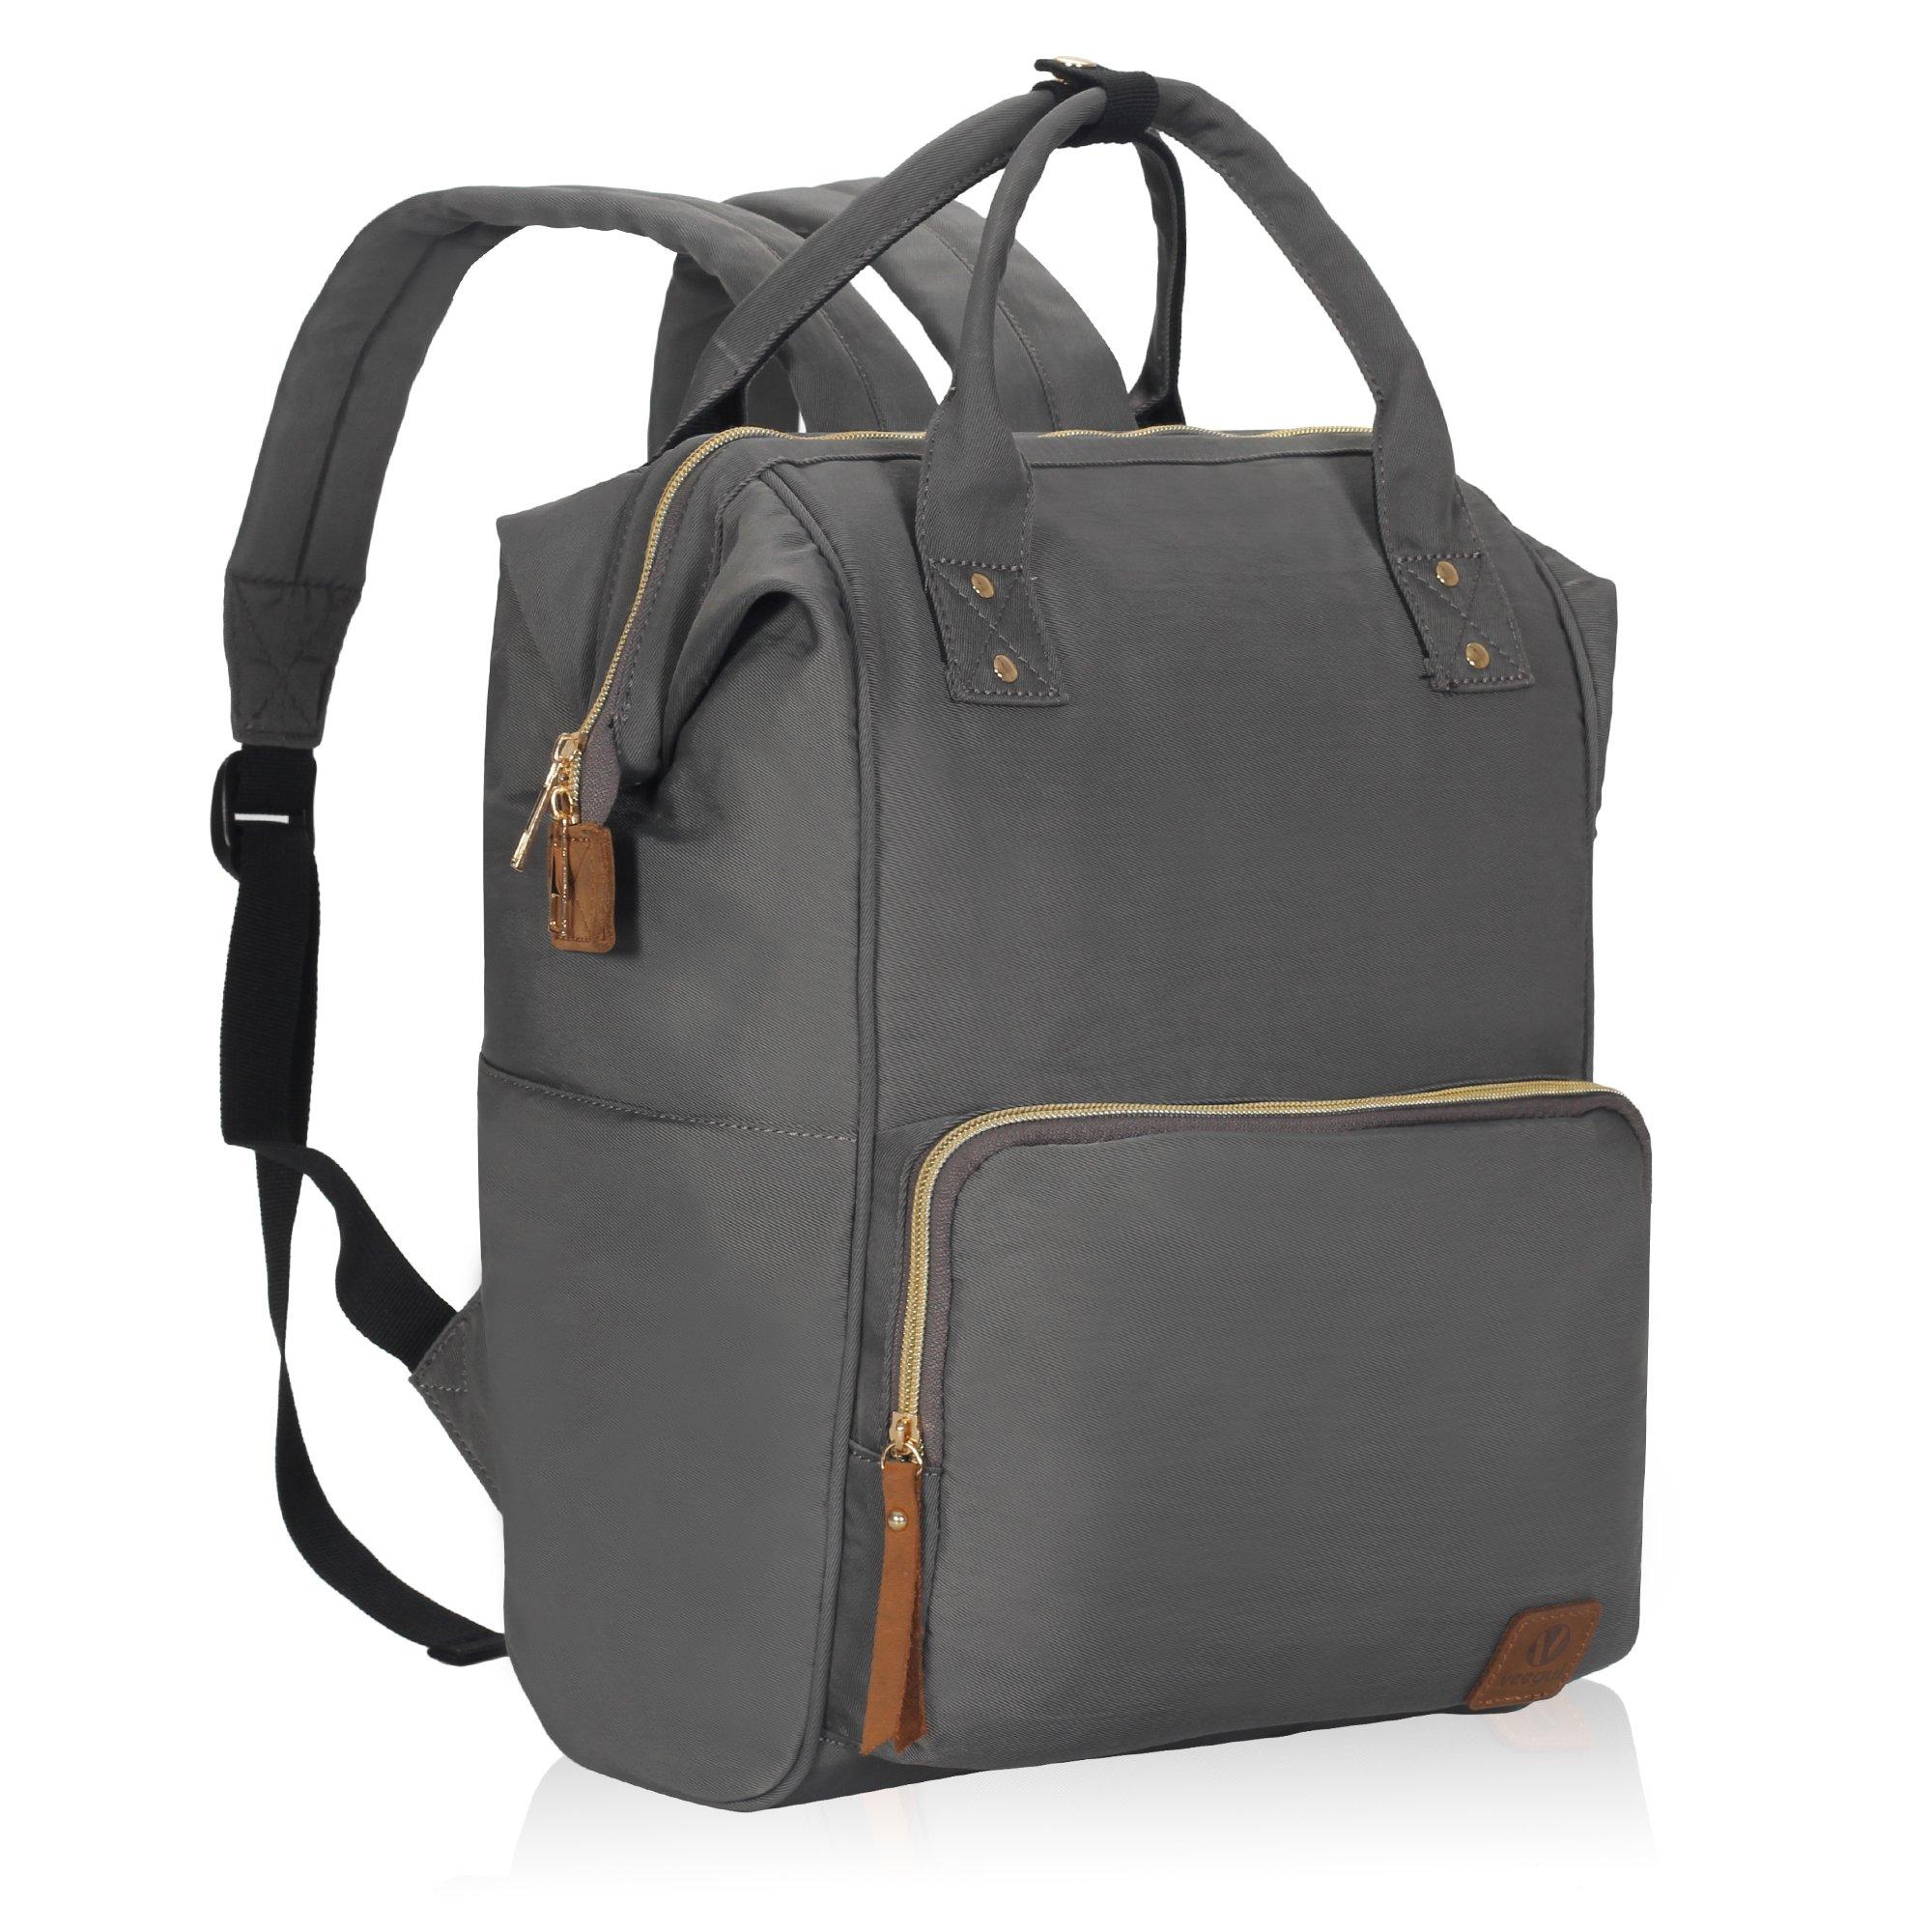 Veegul Wide Open Multipurpose School Backpack Lightweight Travel Bag 18L Grey